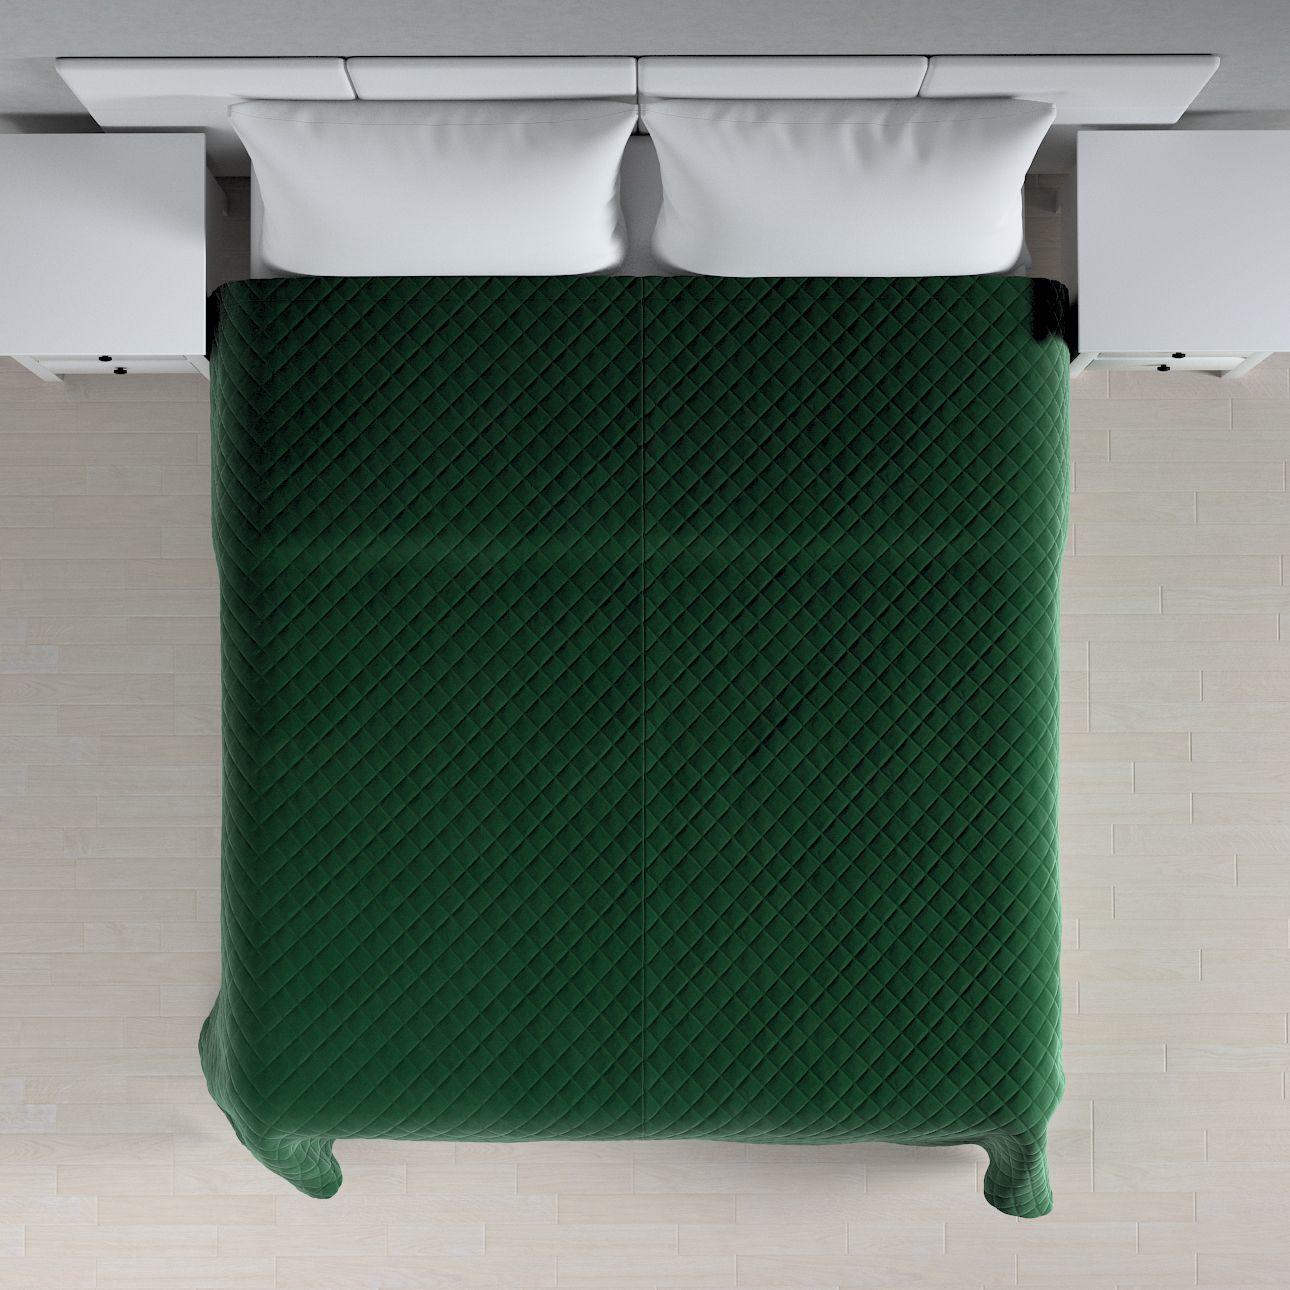 Narzuta pikowana w romby, butelkowa zieleń, szer.210  dł.170 cm, Velvet